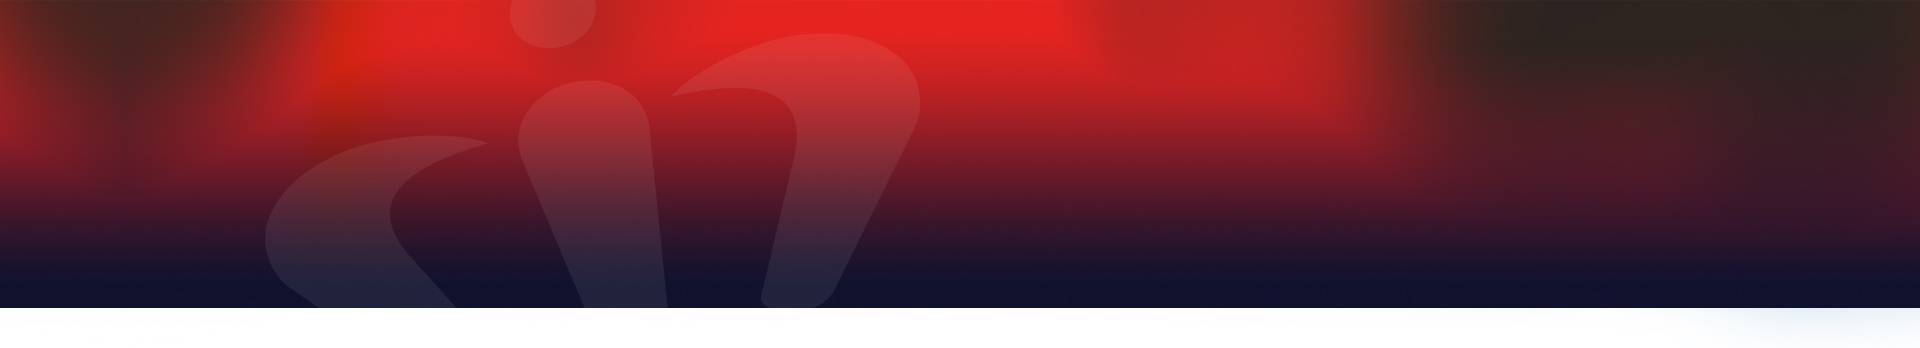 header-achtergrond-minderhoog-rood